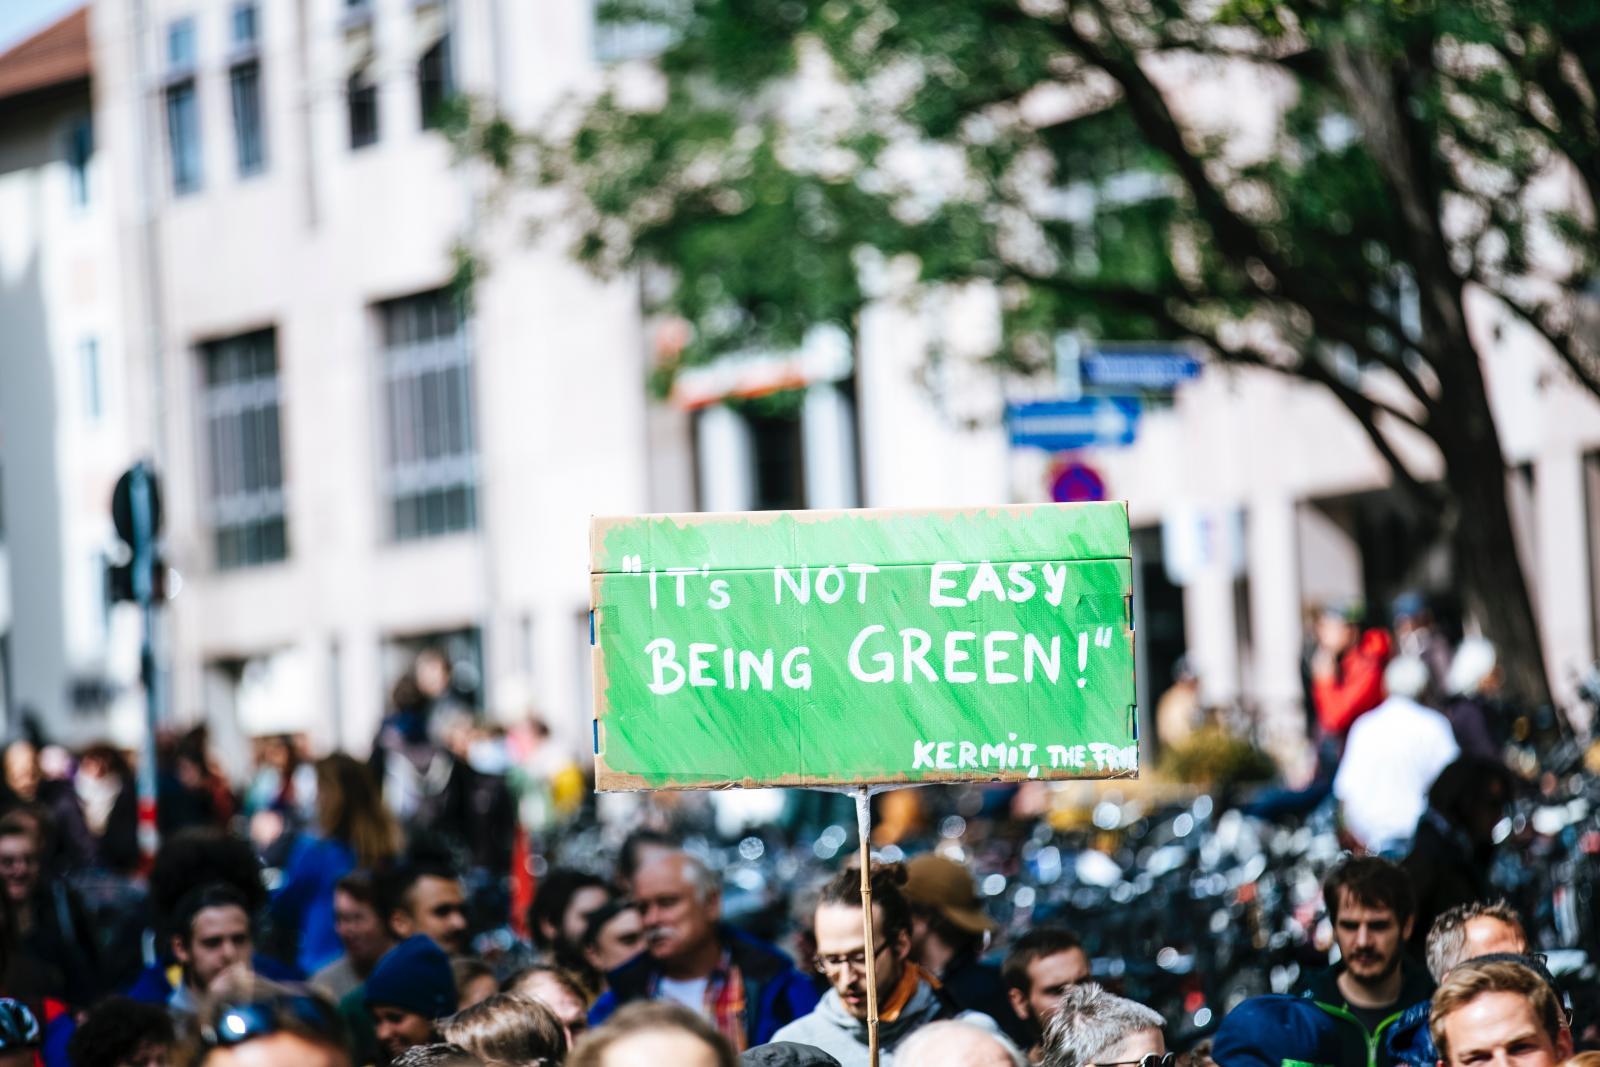 Climate crisis demonstration. Photo credit: Pexels